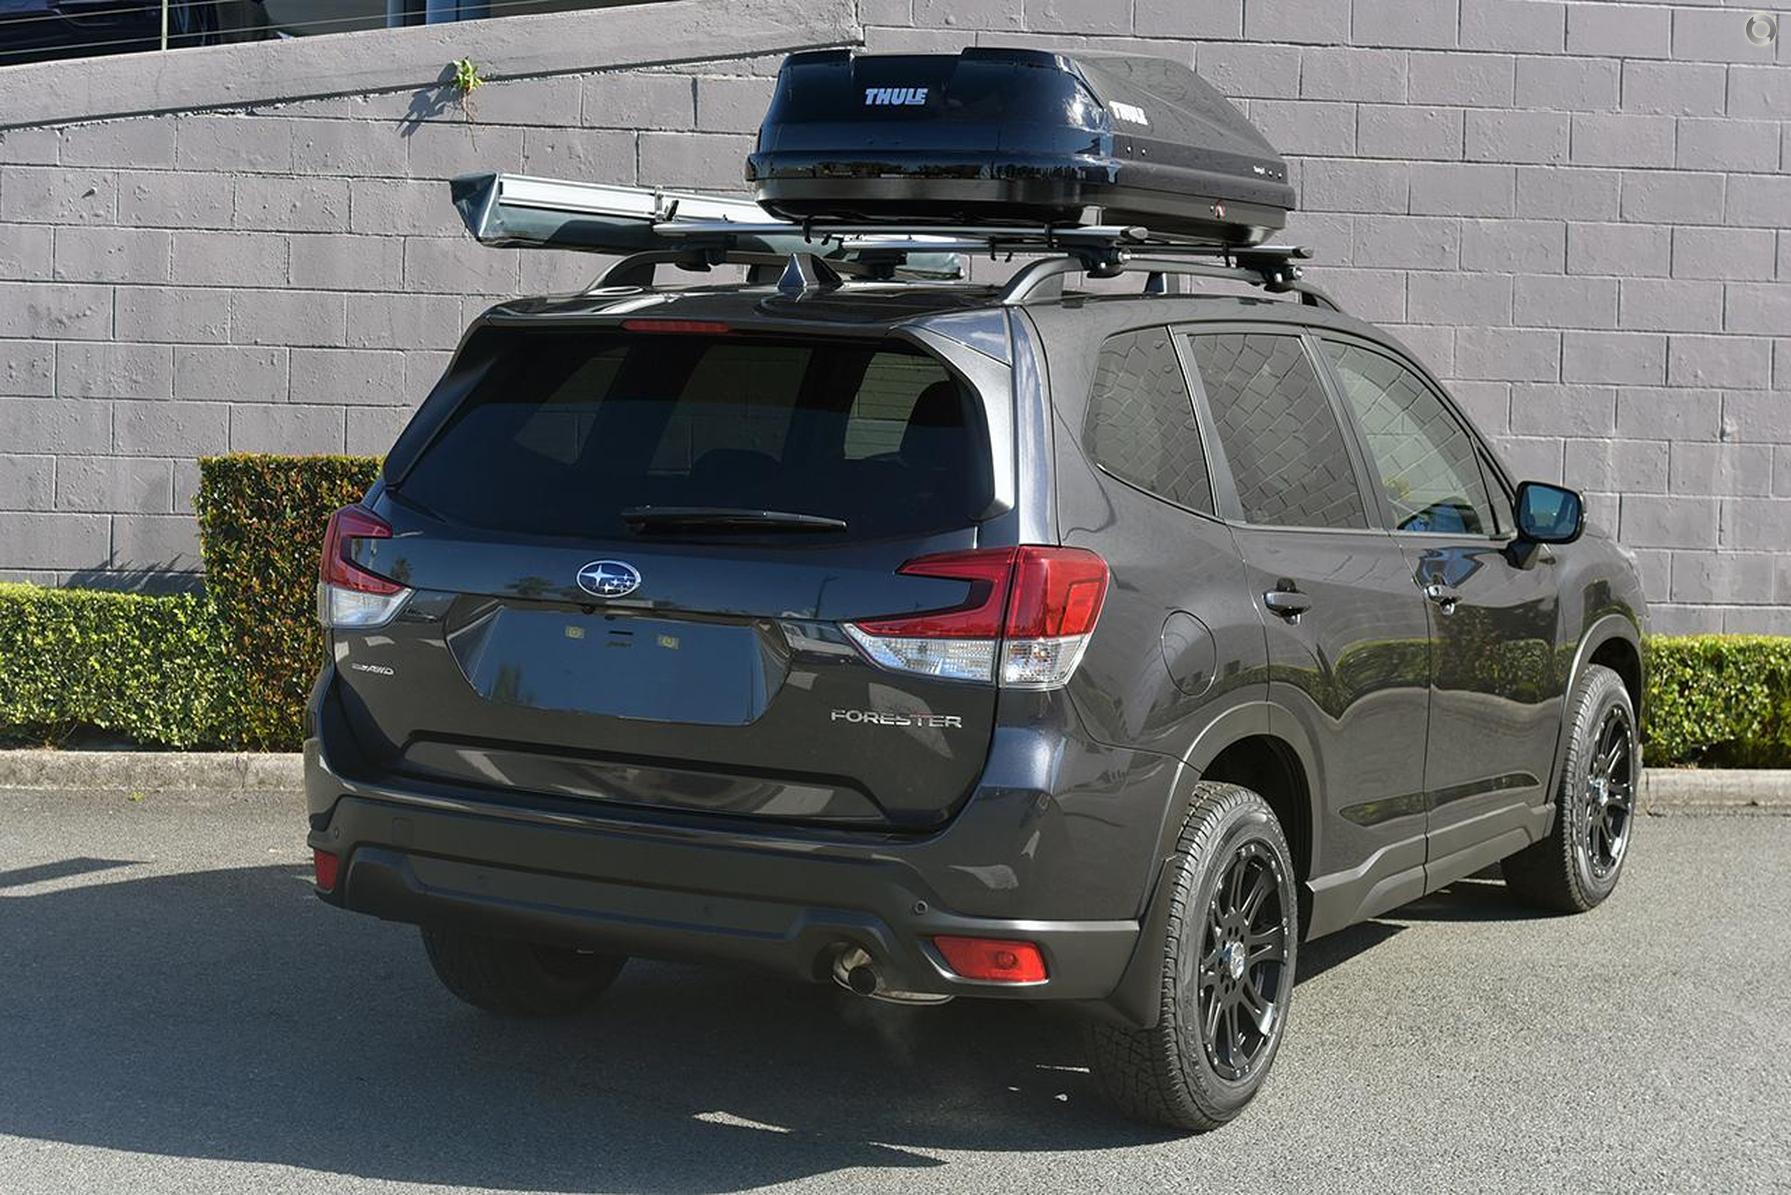 2019 Subaru Forester 2.5i-L S5